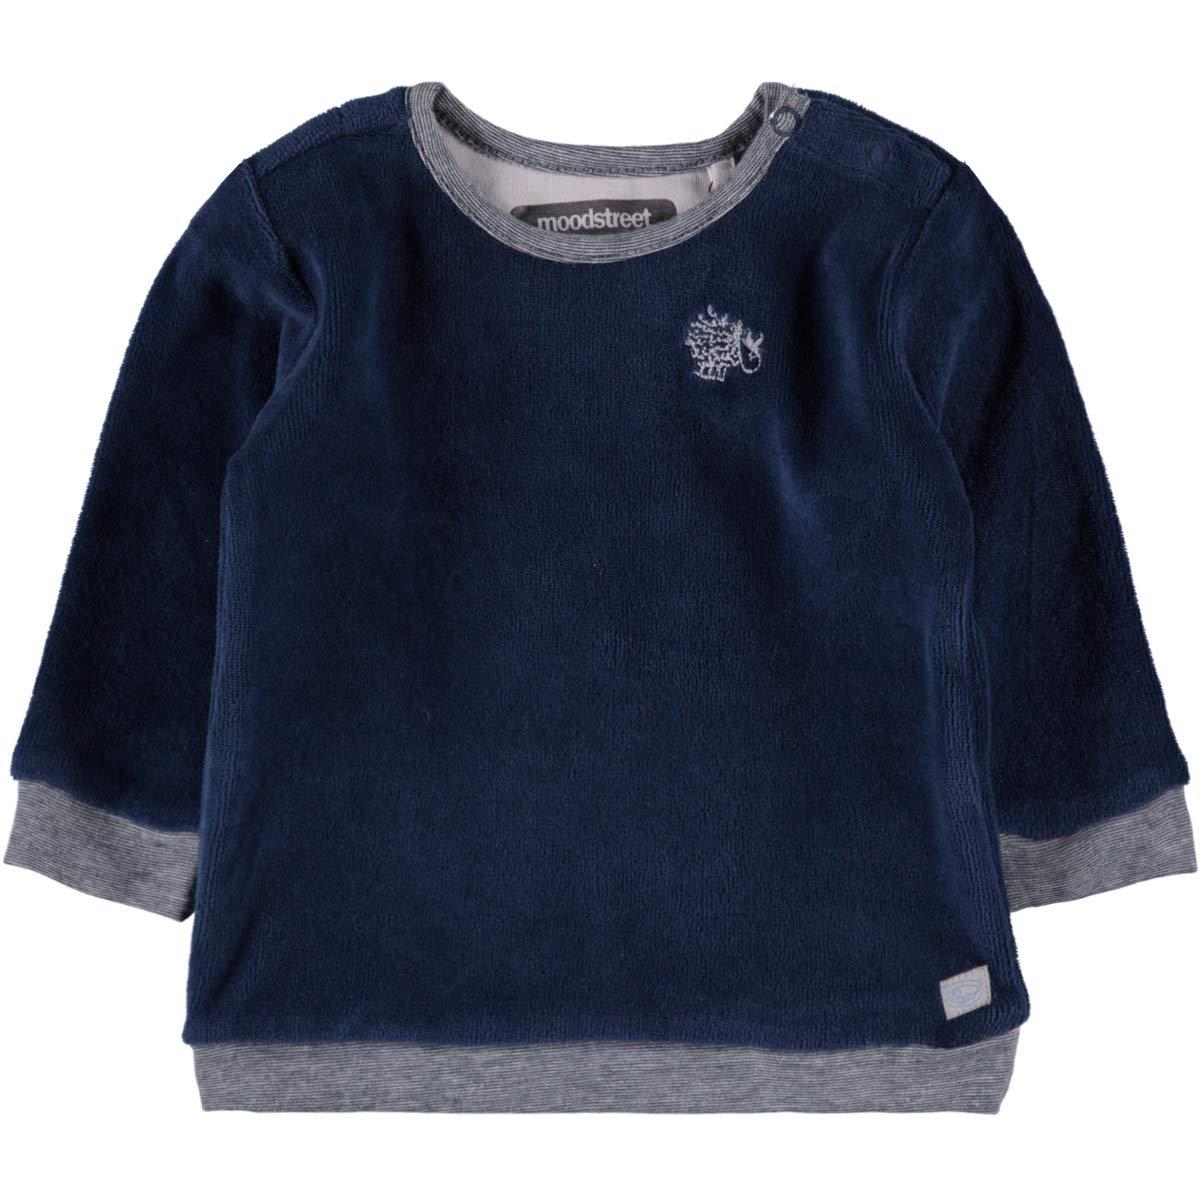 Moodstreet Baby Jungen Boys Nicki Shirt Pulli Langarm Petrol Blue 9383-175 (68)